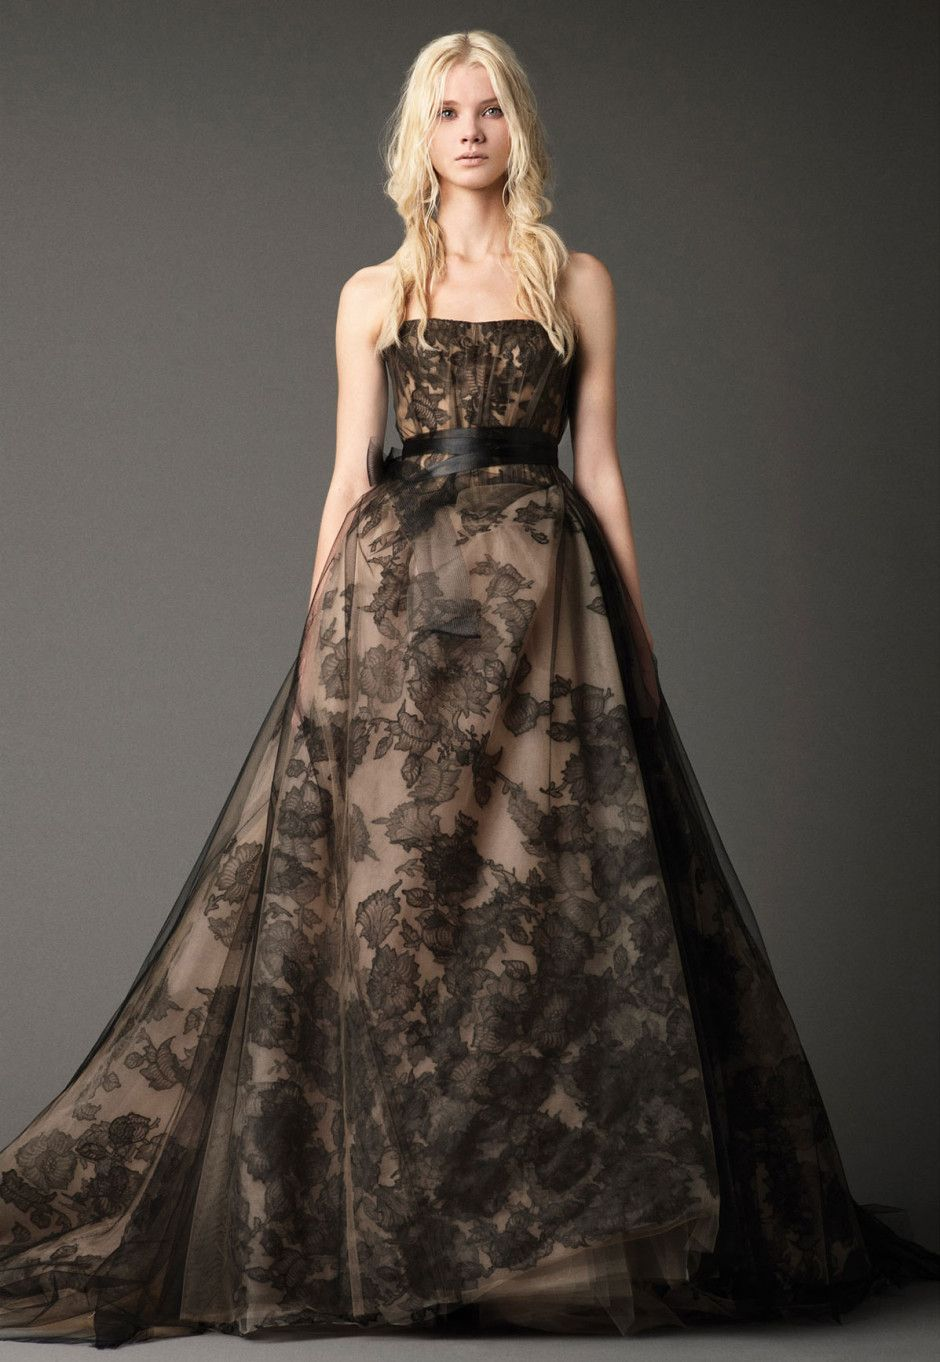 Superb Black Gold Wedding Dress by Vera Wang